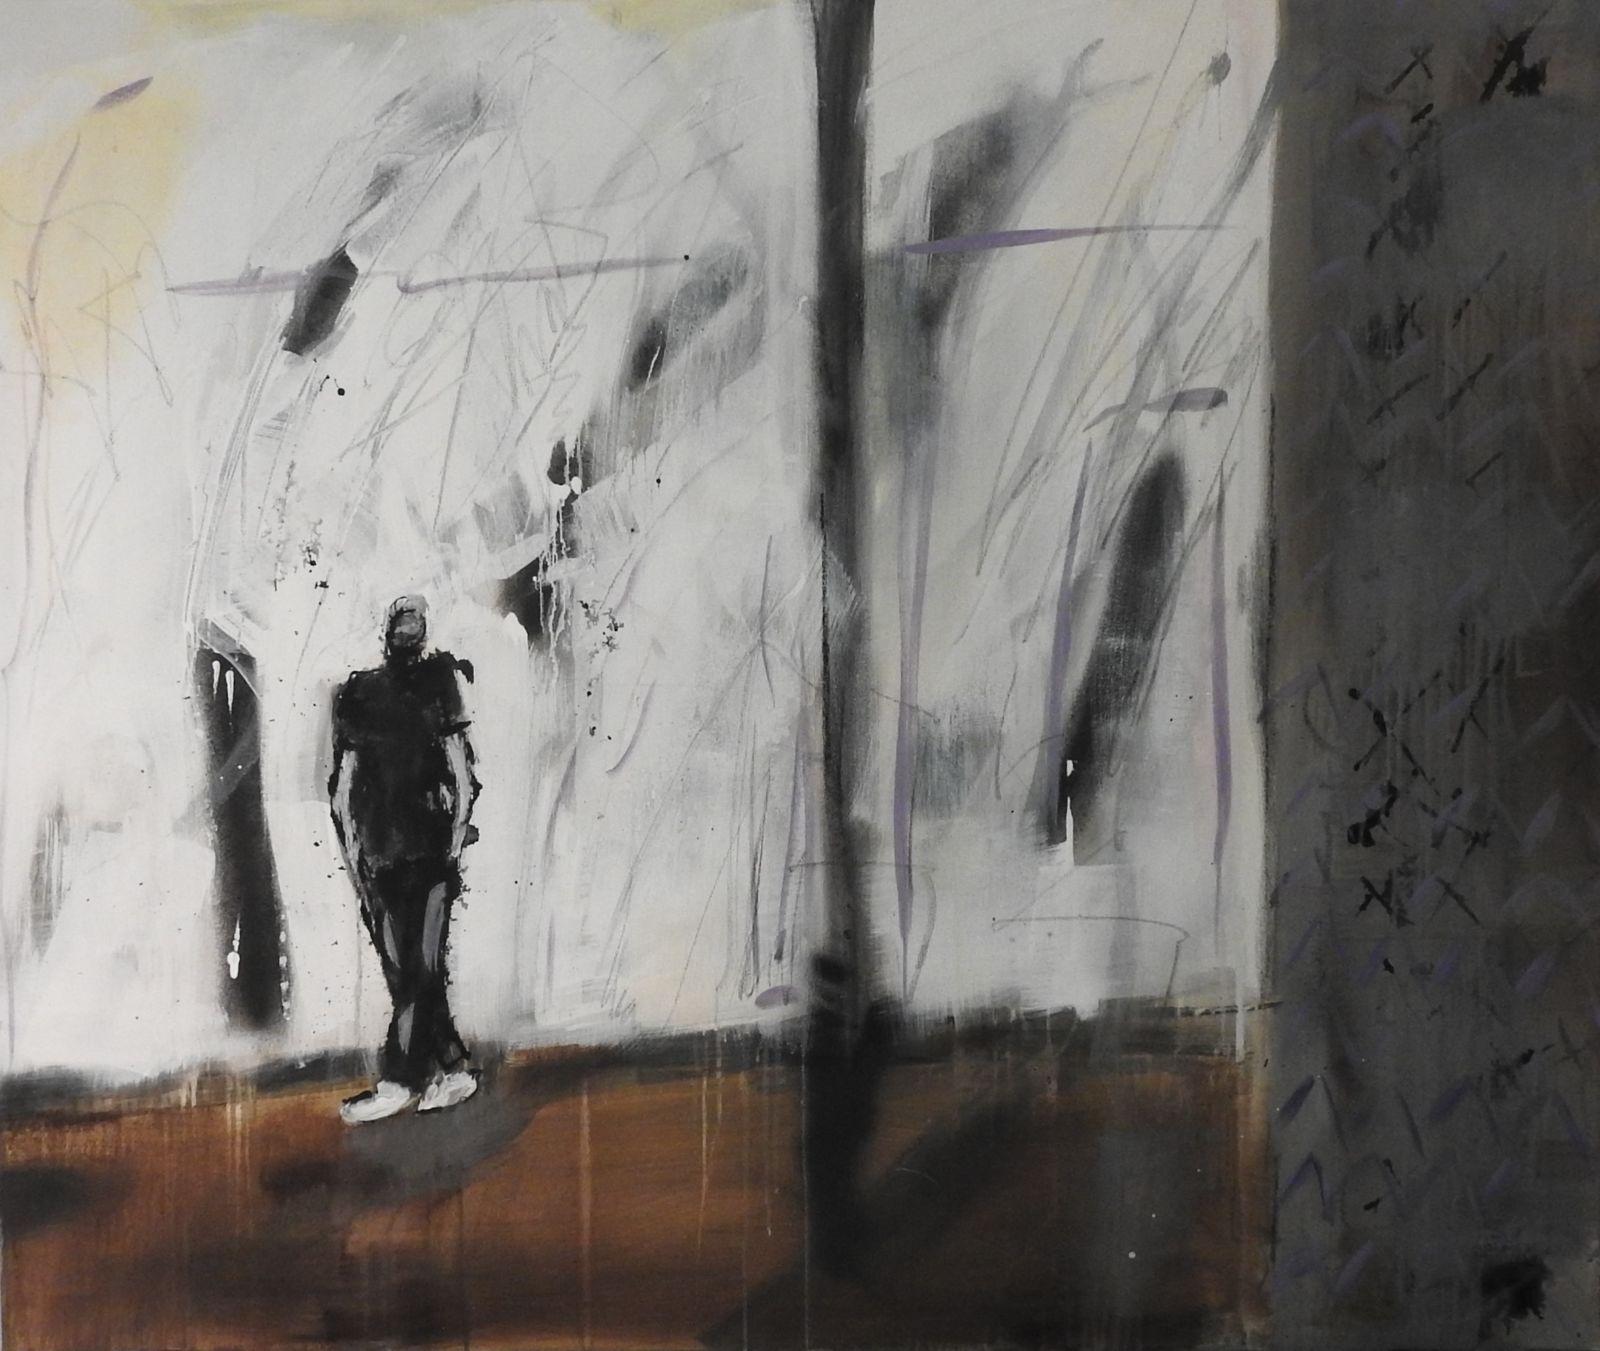 Urban_solitude_II__100x120.JPG